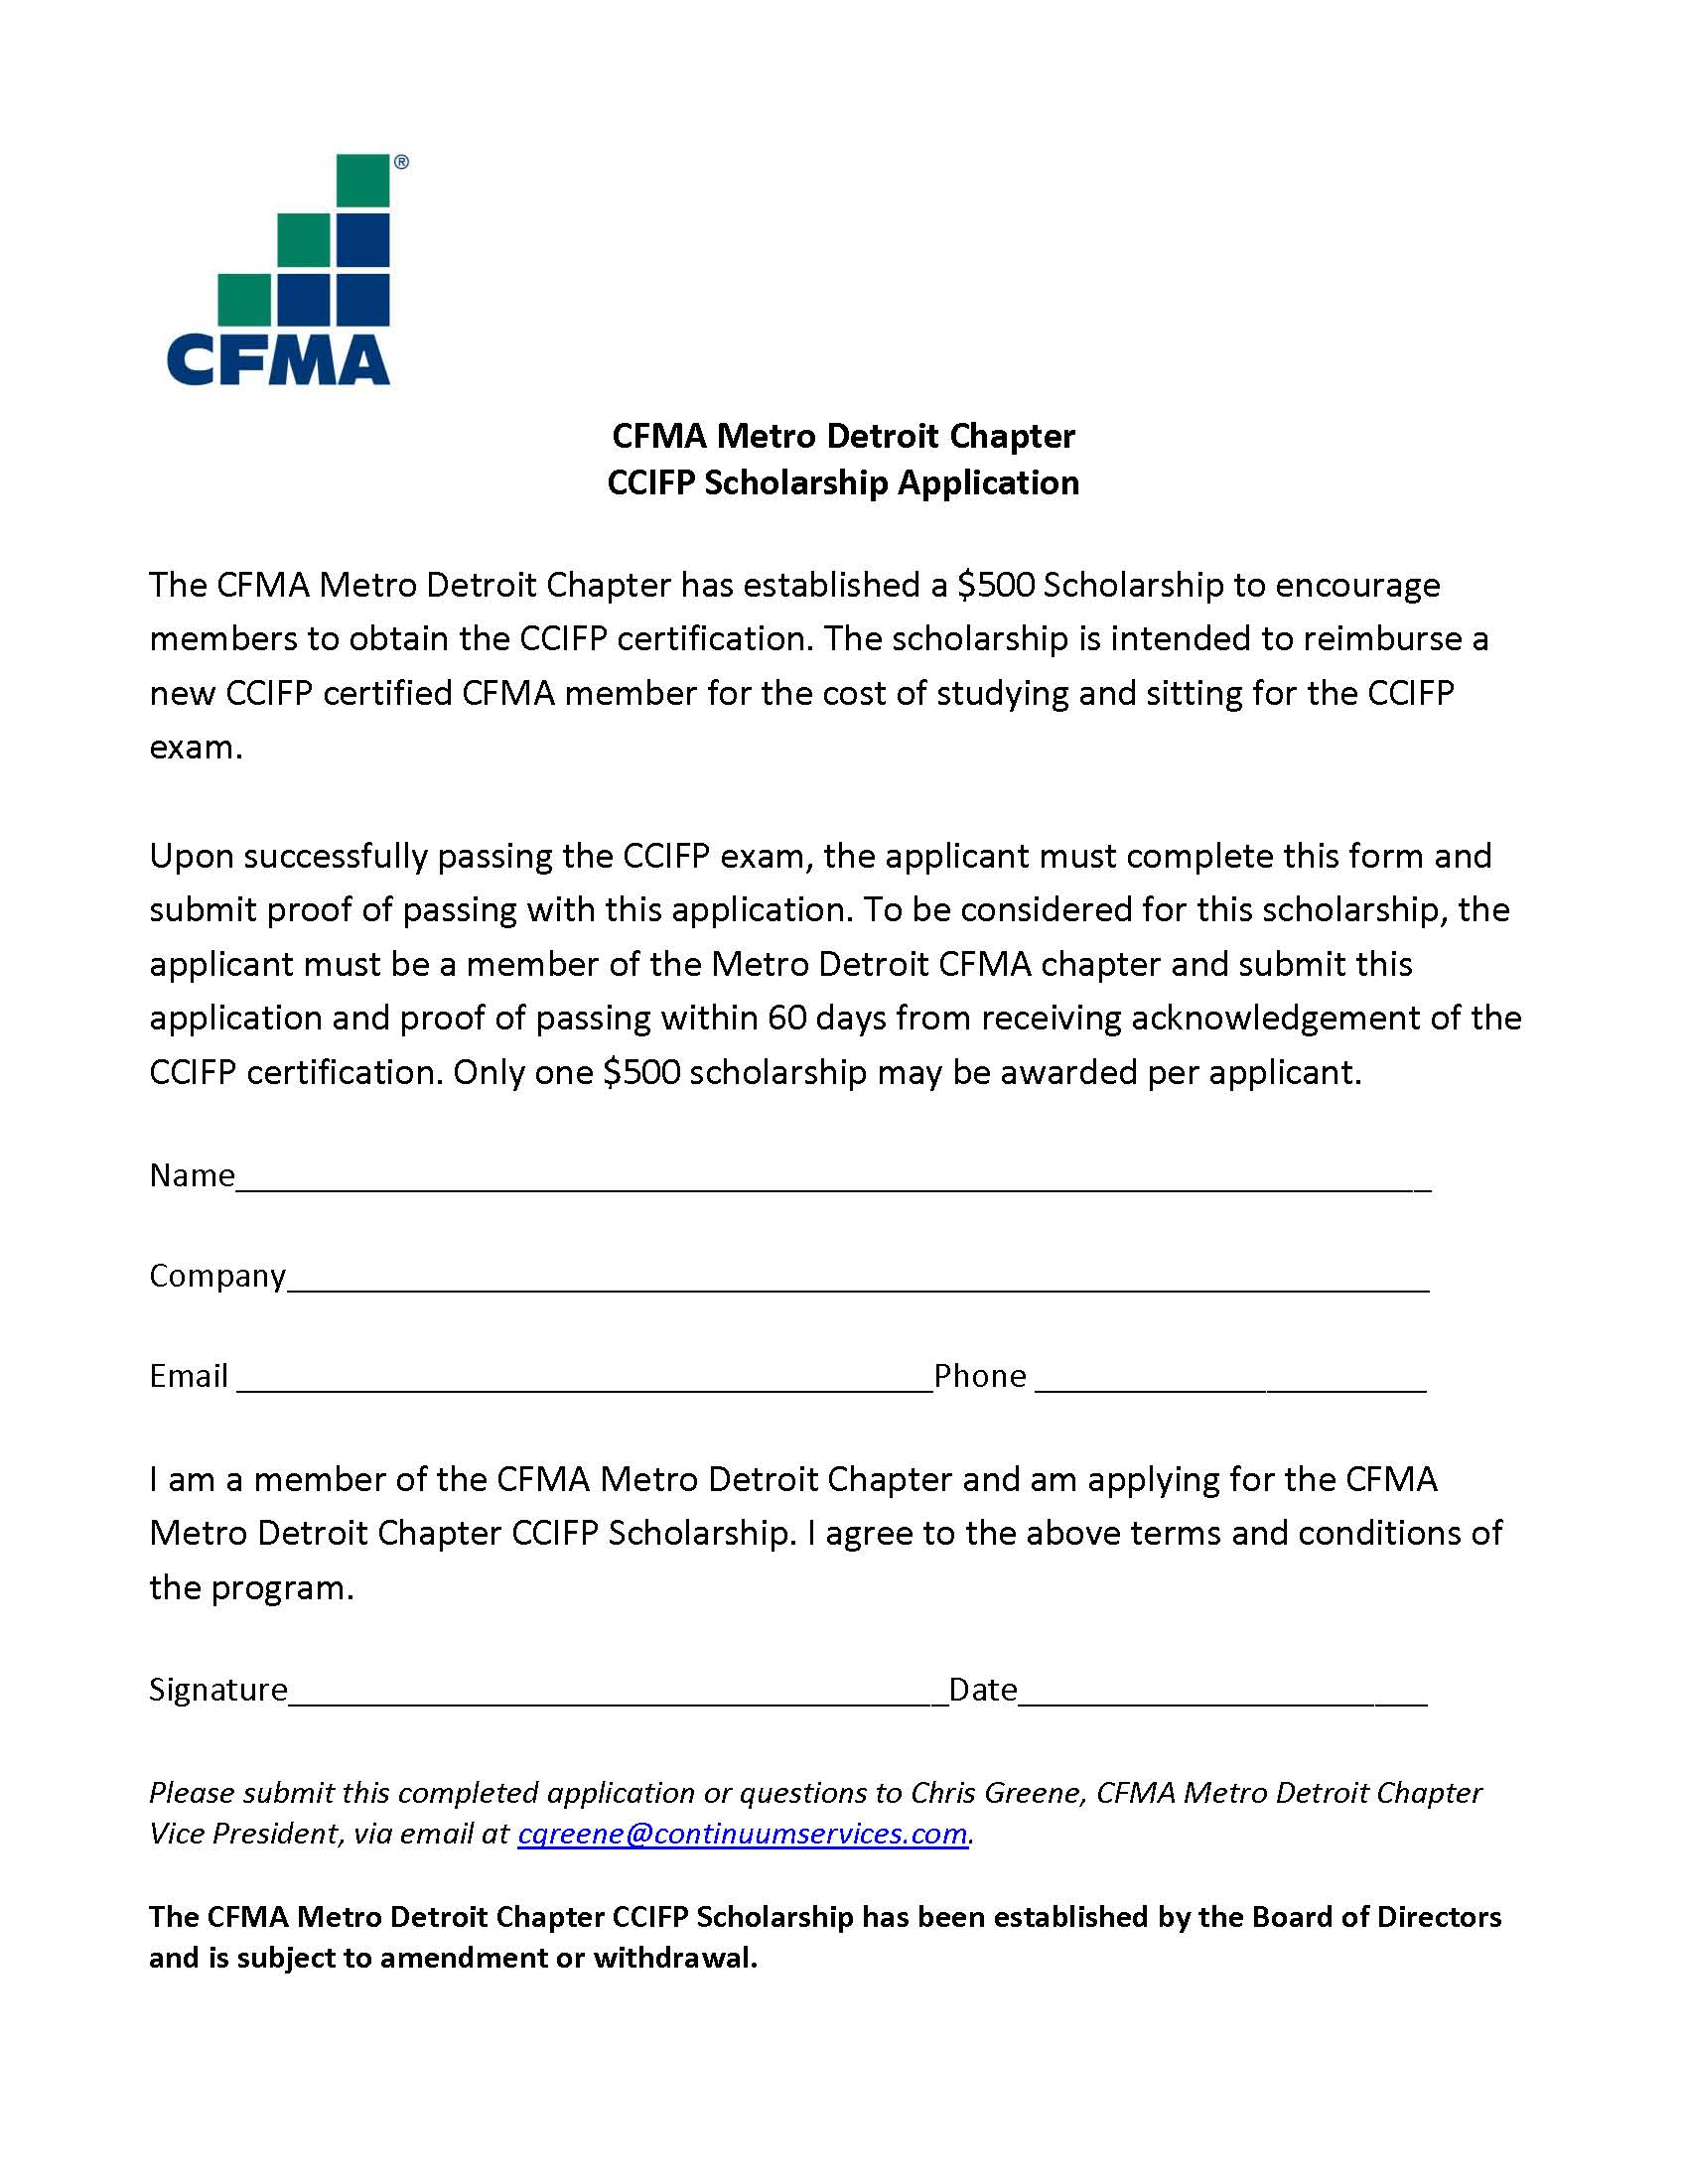 CFMA Scholarship Application